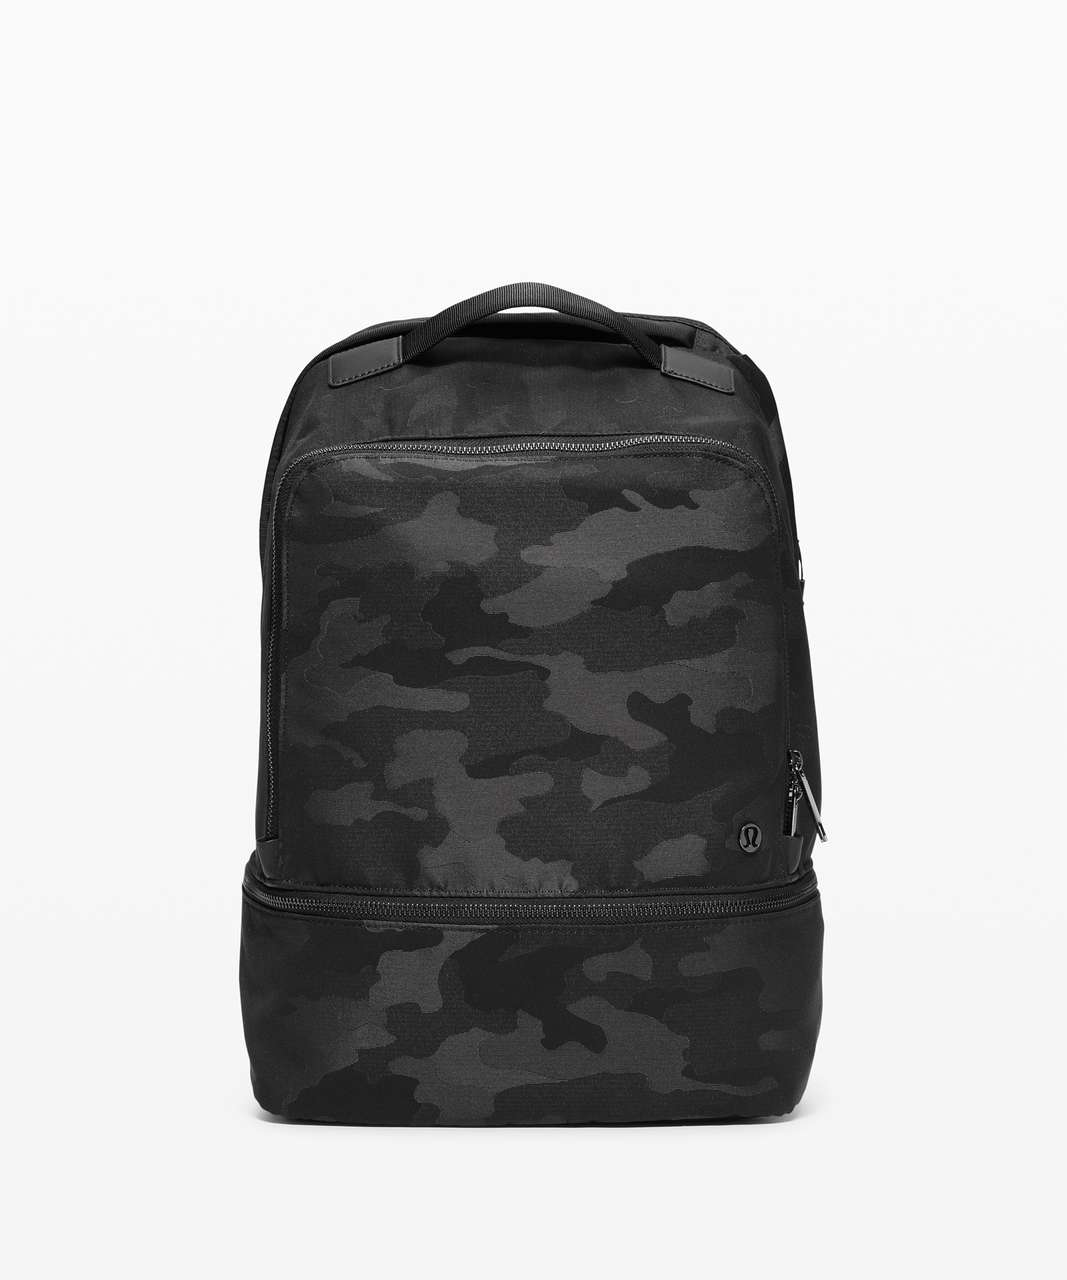 Lululemon City Adventurer Backpack *17L - Heritage Camo Jacquard Max Black Graphite Grey